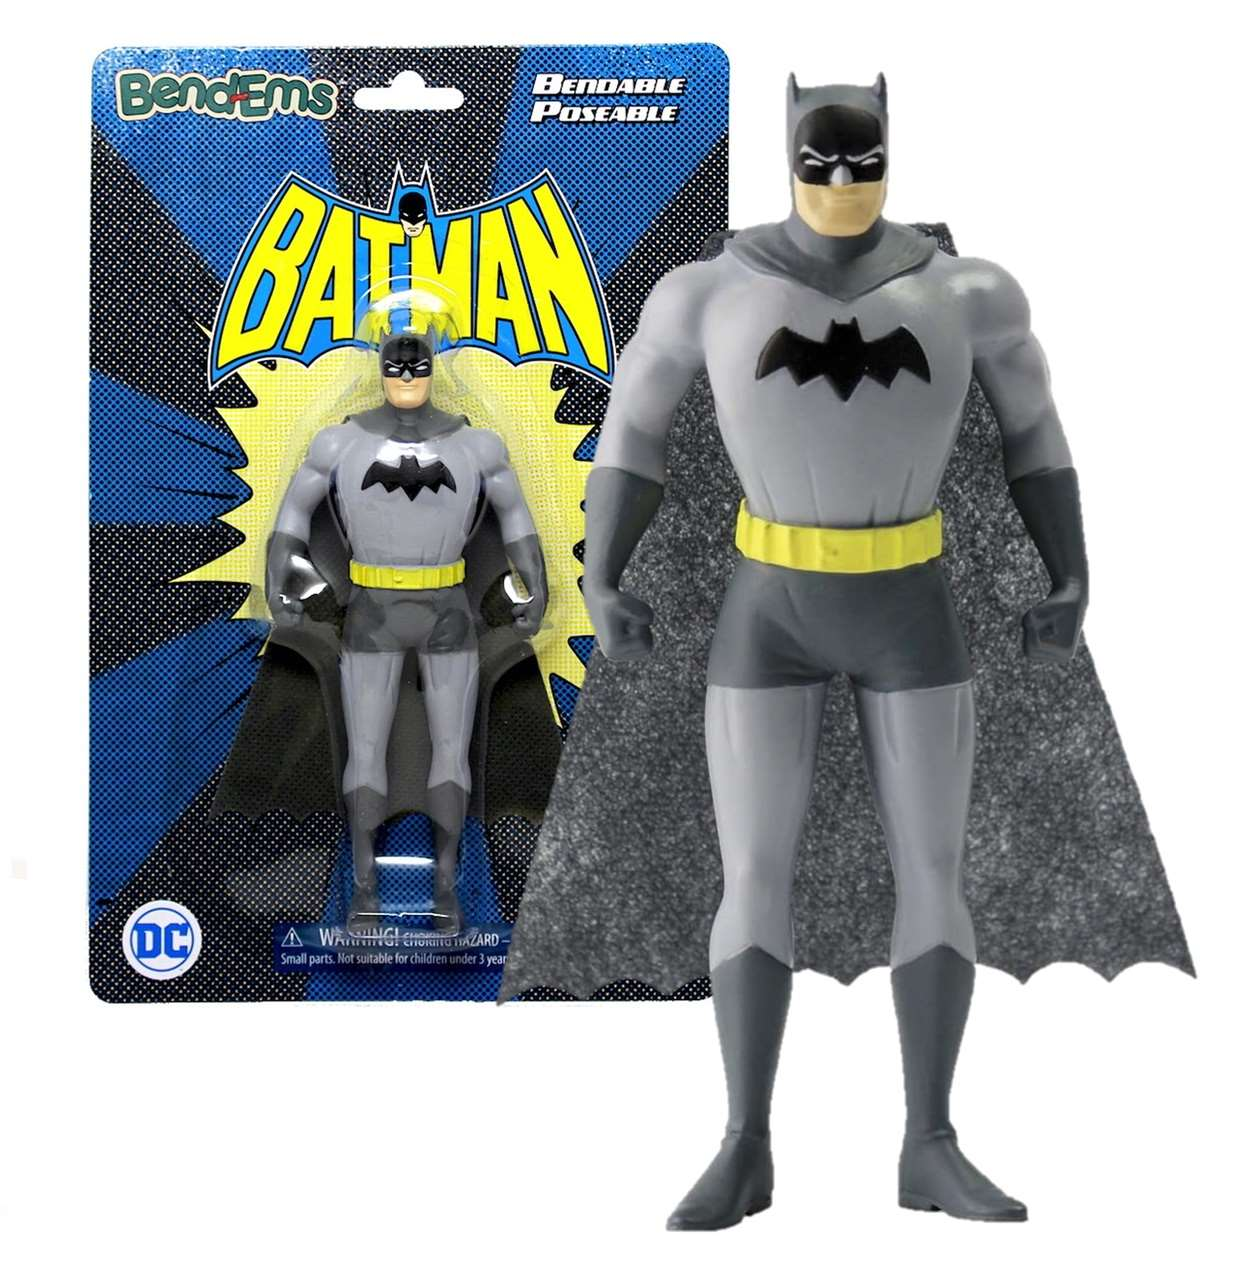 Batman Vintage Bendable Poseable Figura Dc Bendems Sunny Day